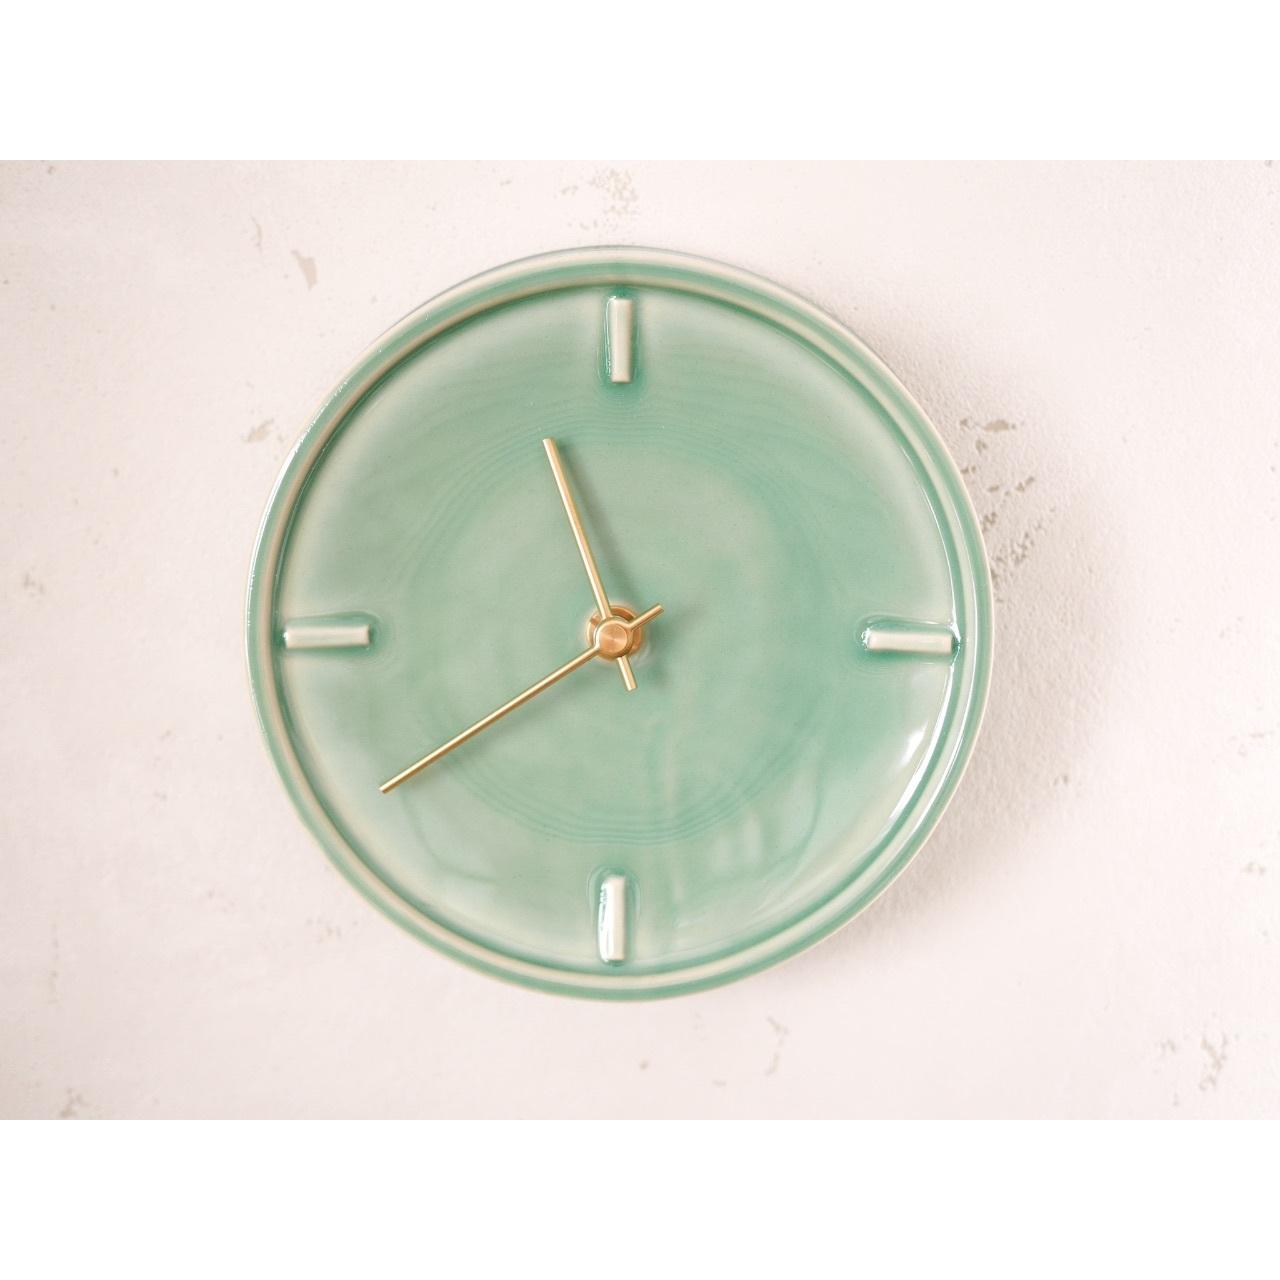 〔美濃焼〕Mint Green Glazed Clock by SUGY